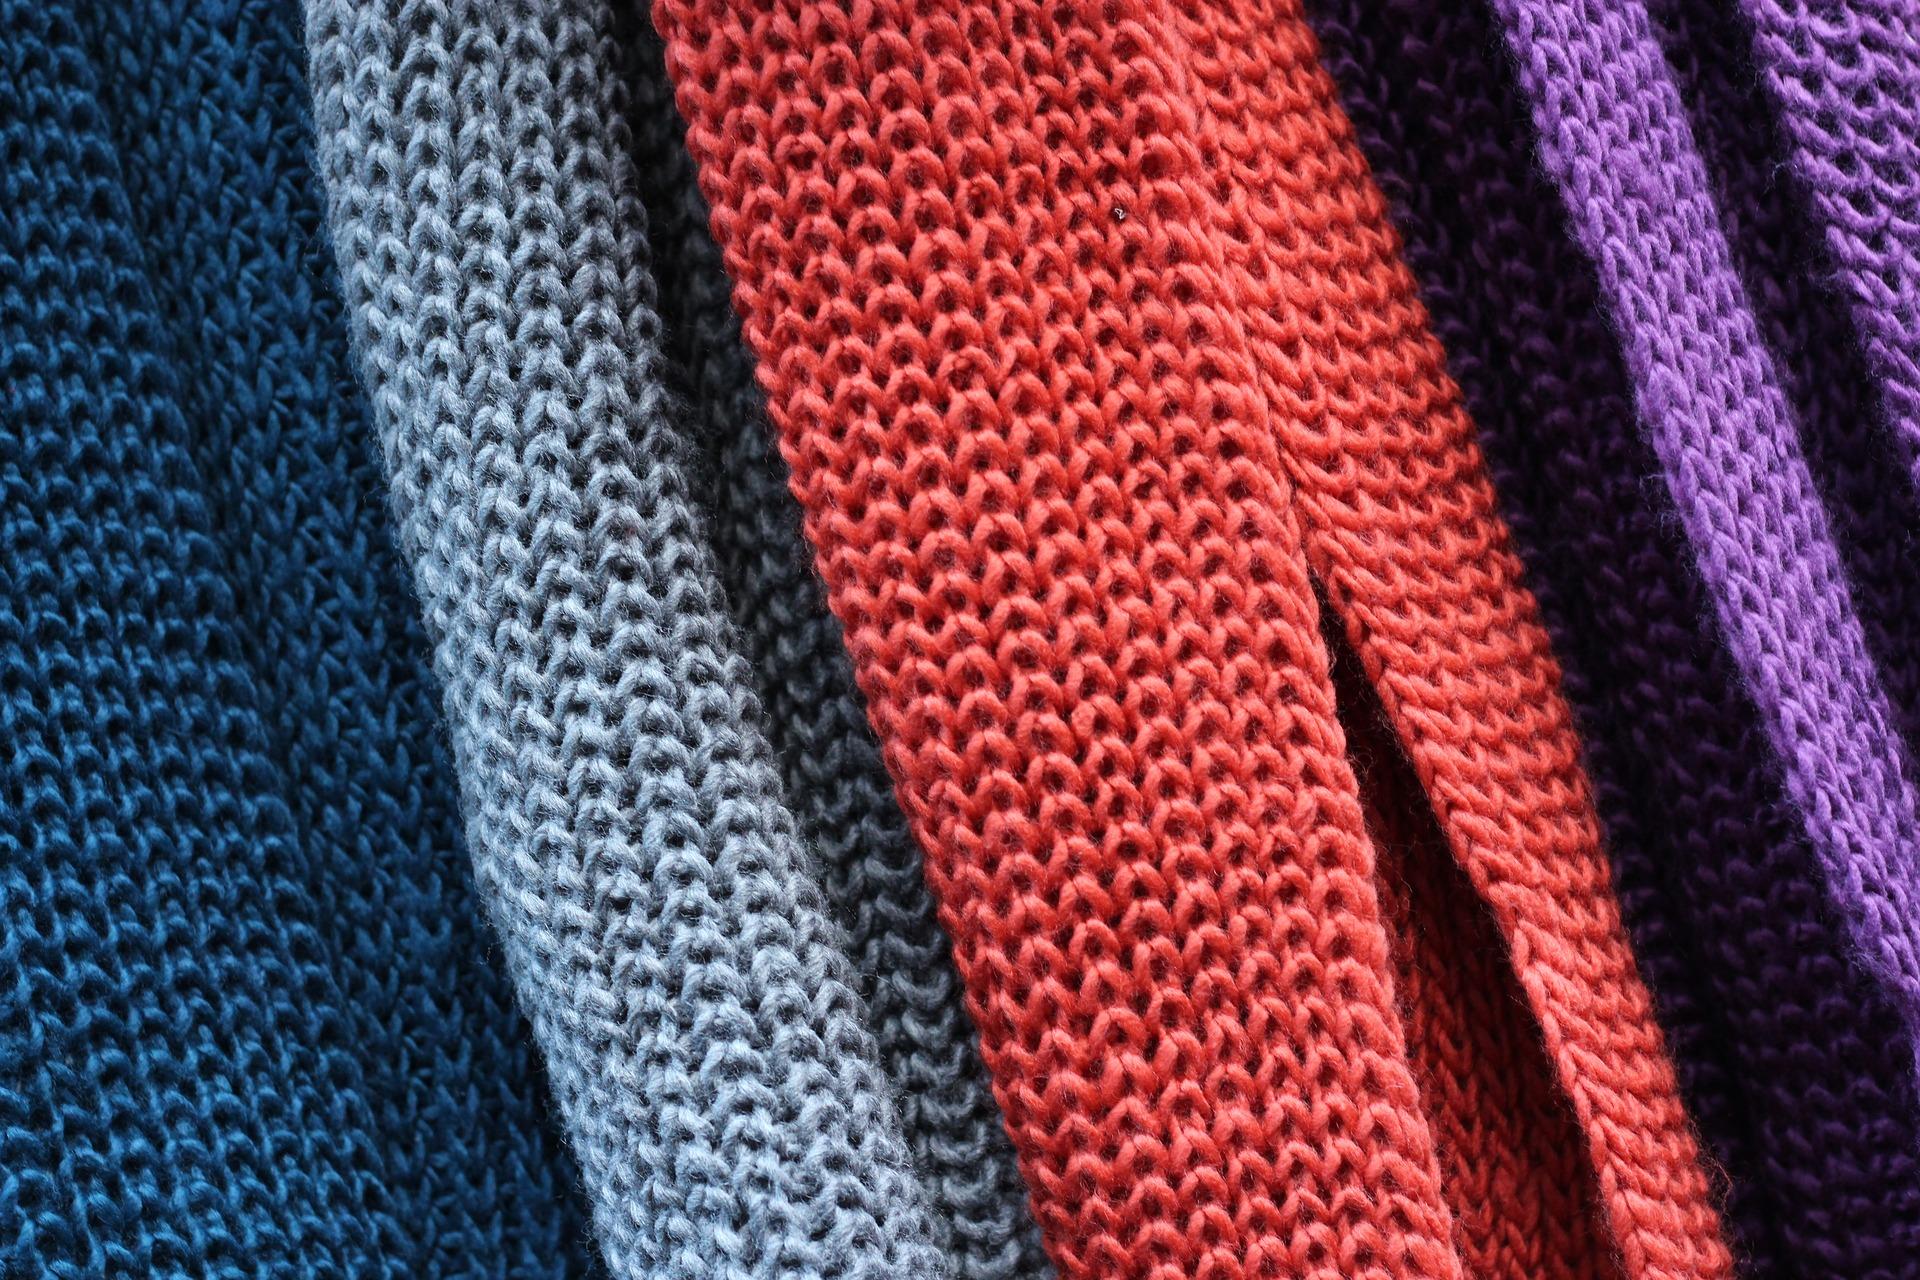 Teli Lana - Wool Pattern